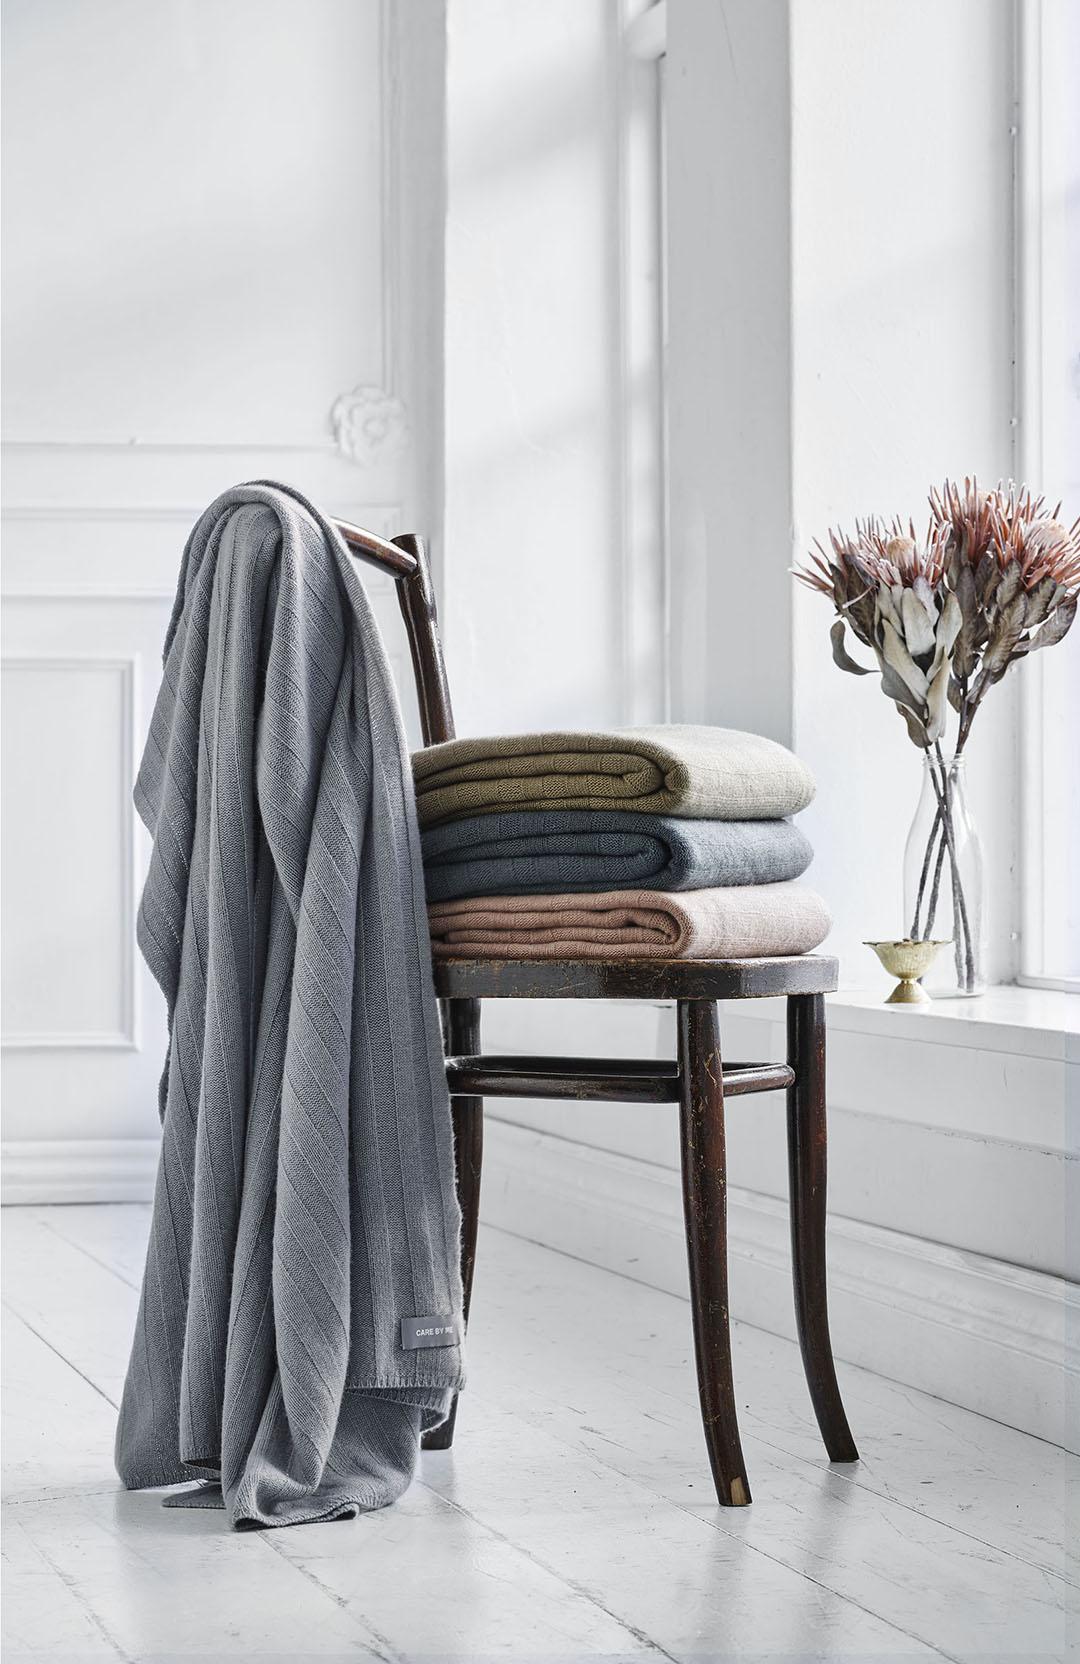 ASROSENVINGE_Carebyme_Formland_Textiles.jpg